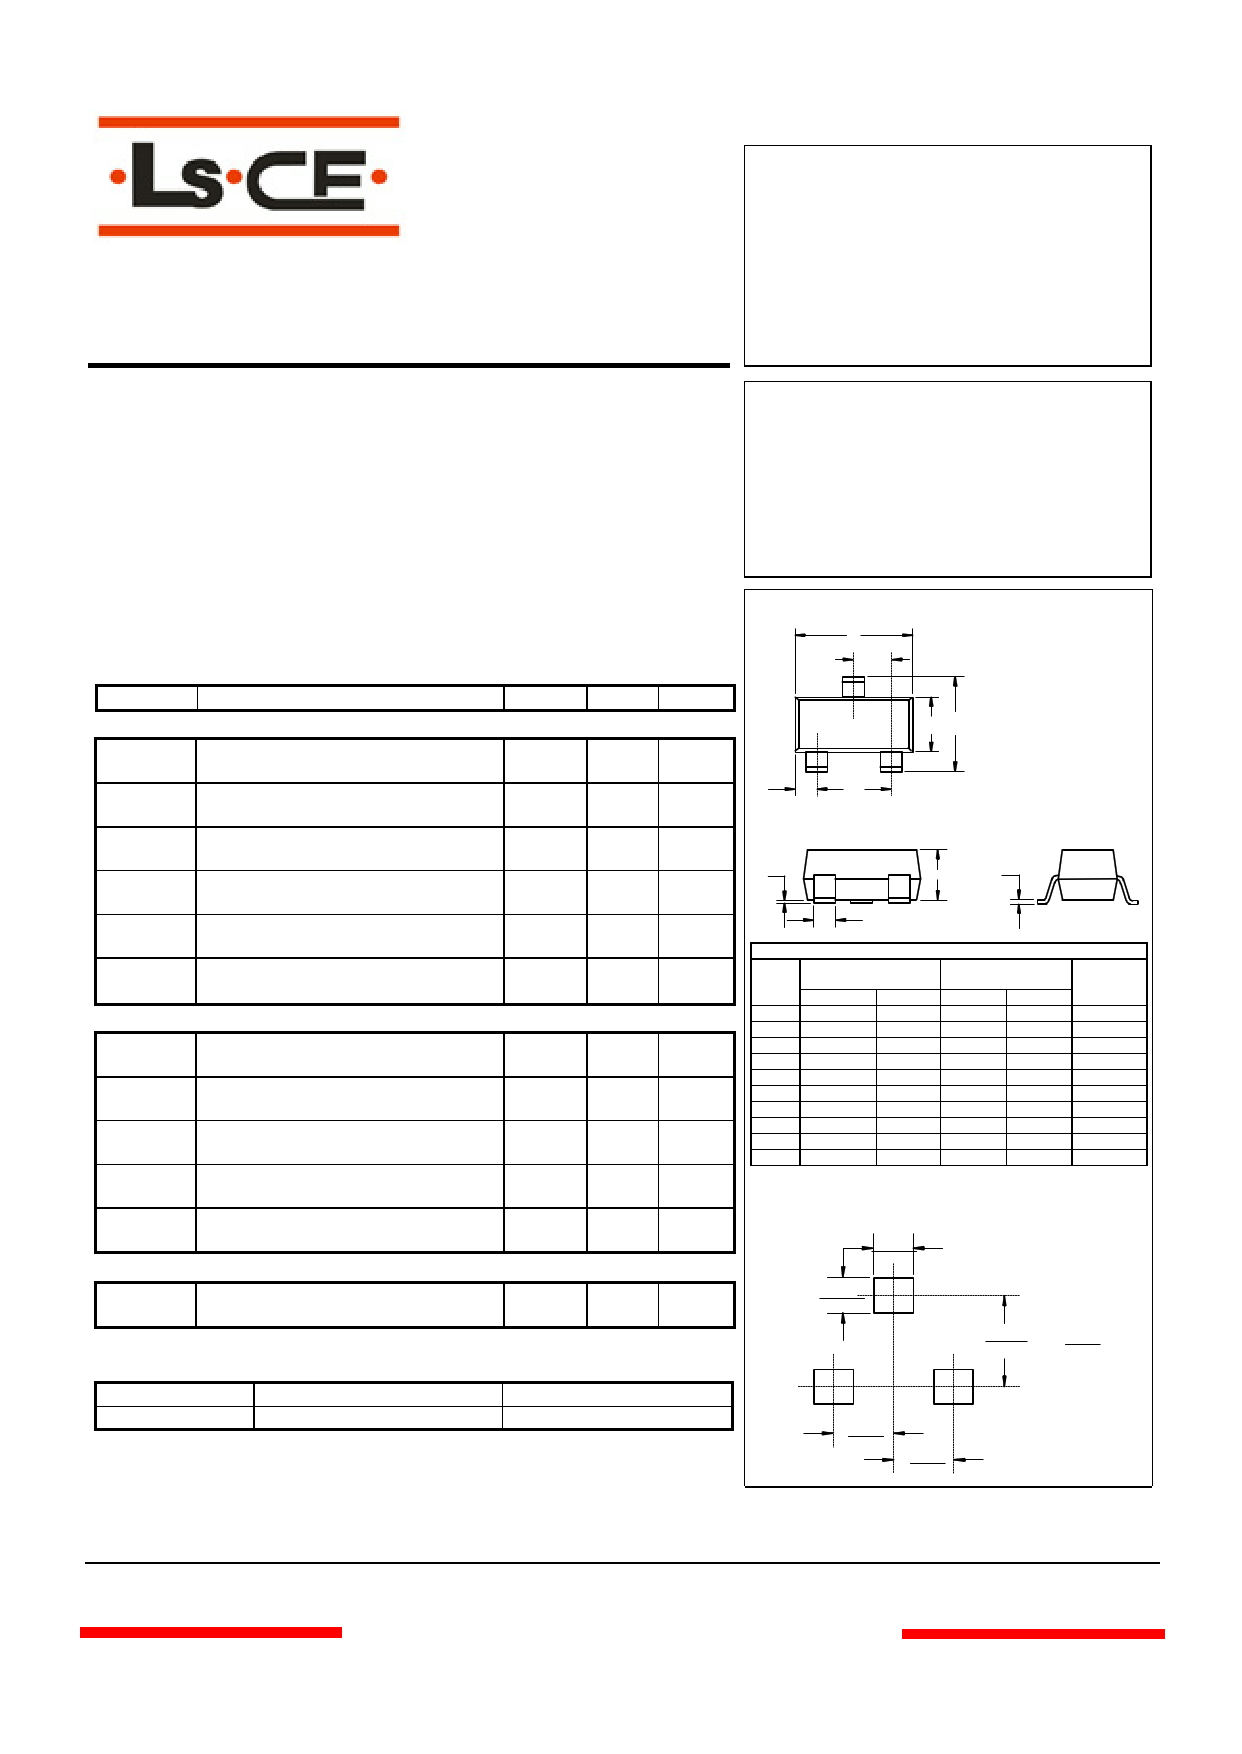 MMS9012 datasheet